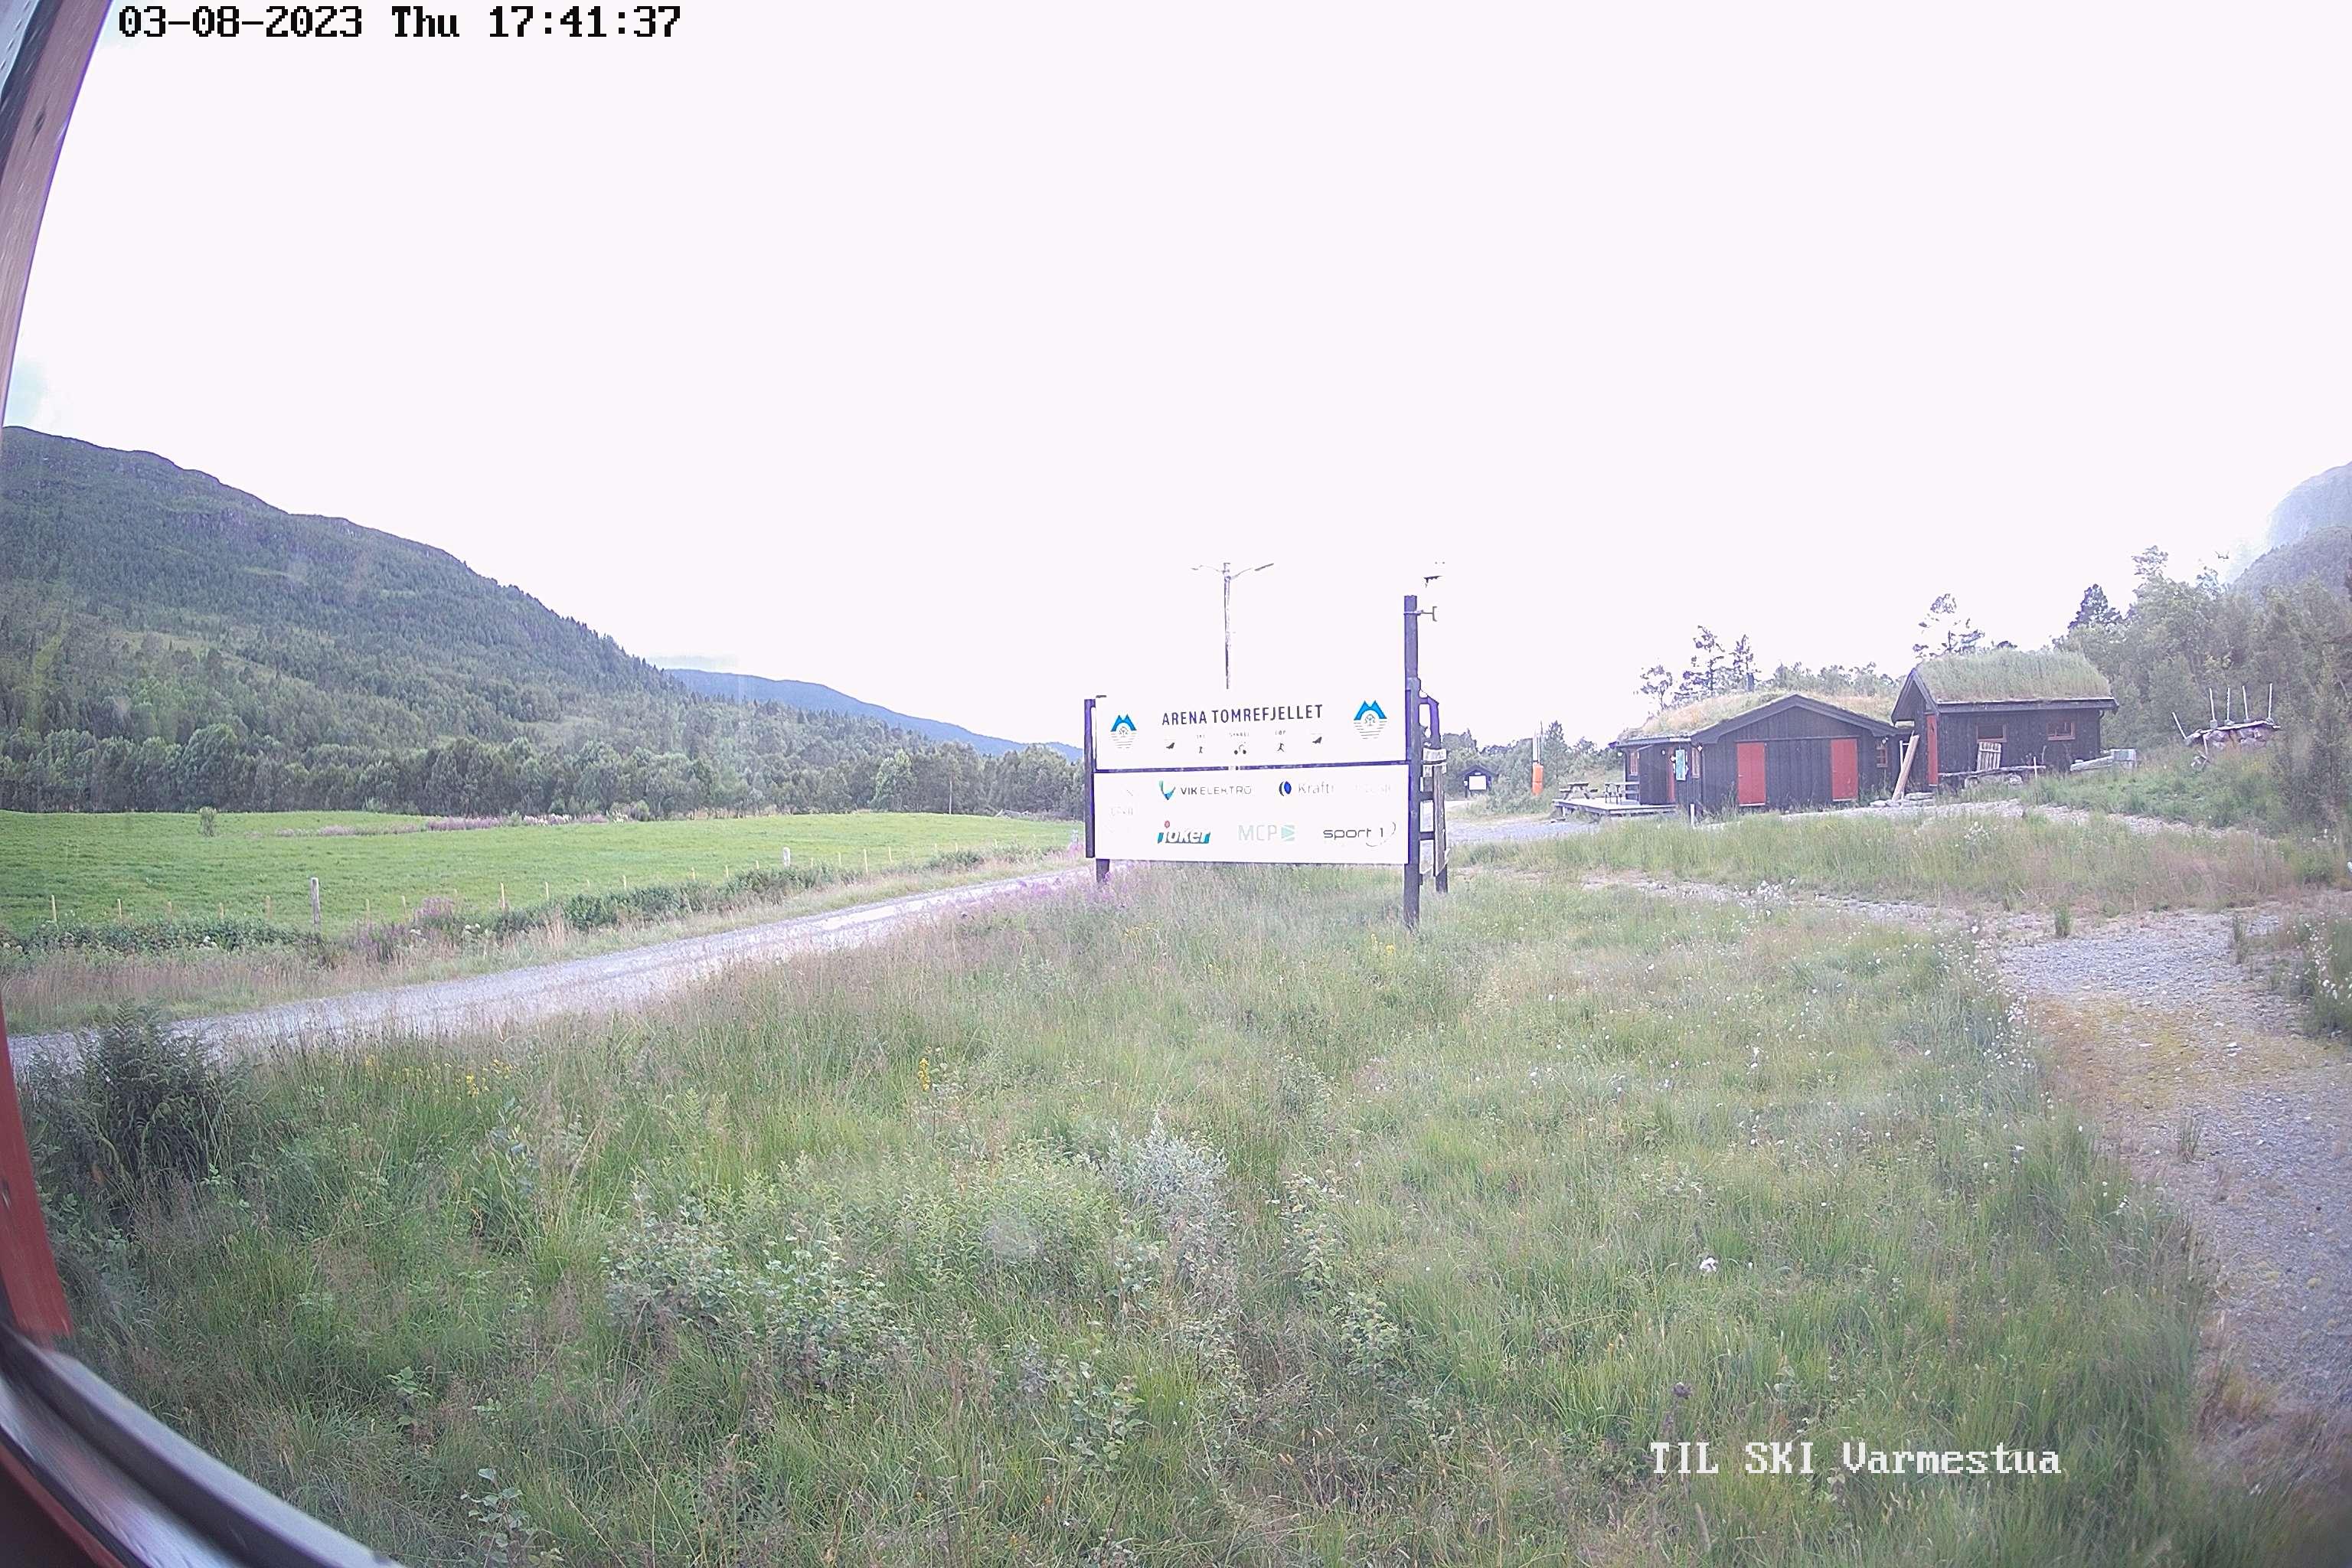 Webcam Tomrehaugen, Vestnes, Møre og Romsdal, Norwegen